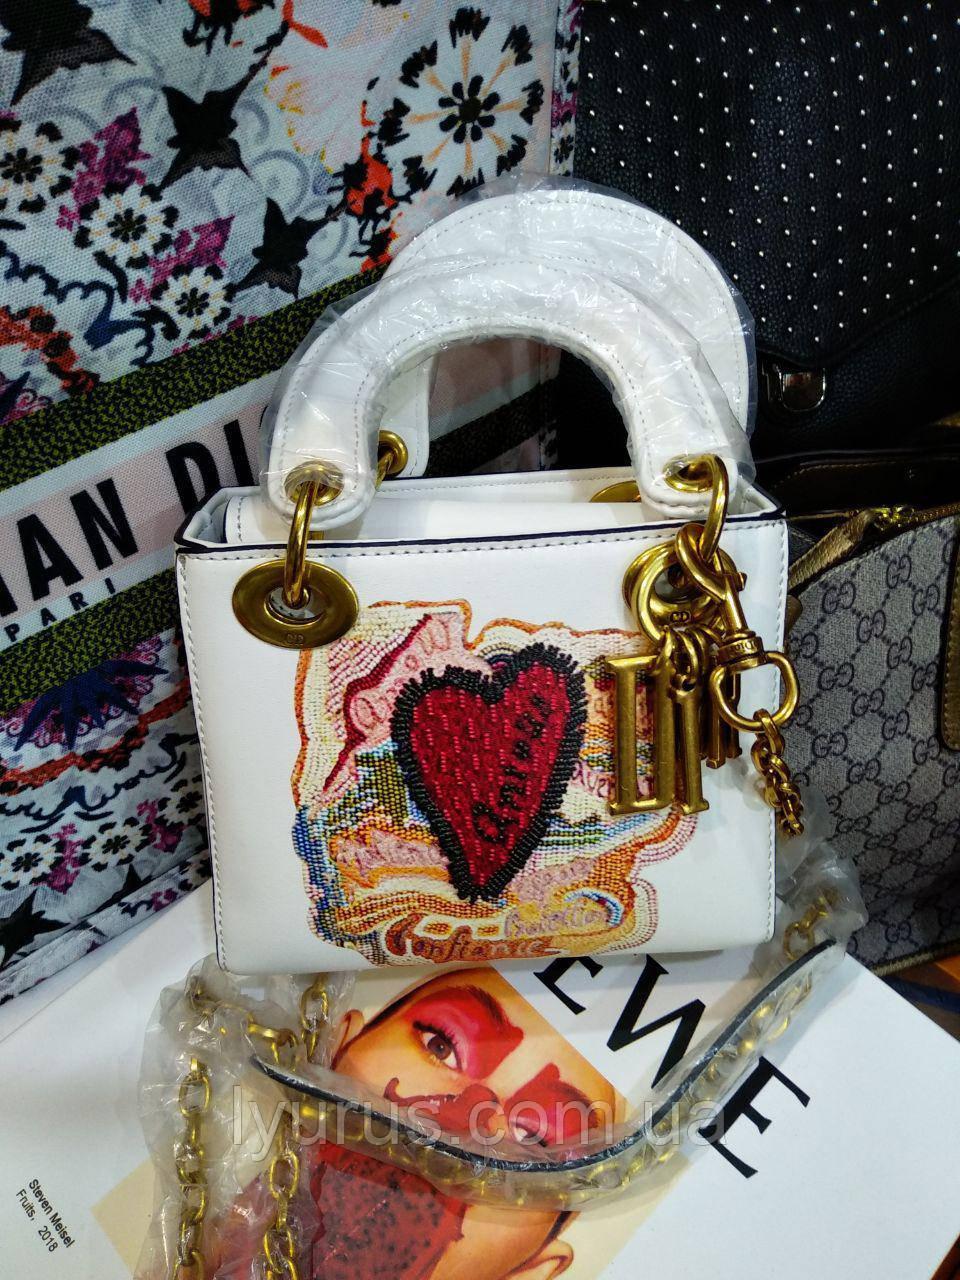 421a4e8f5c66 Женская сумка белая в стиле Dior mini яркая вышивка : продажа, цена ...